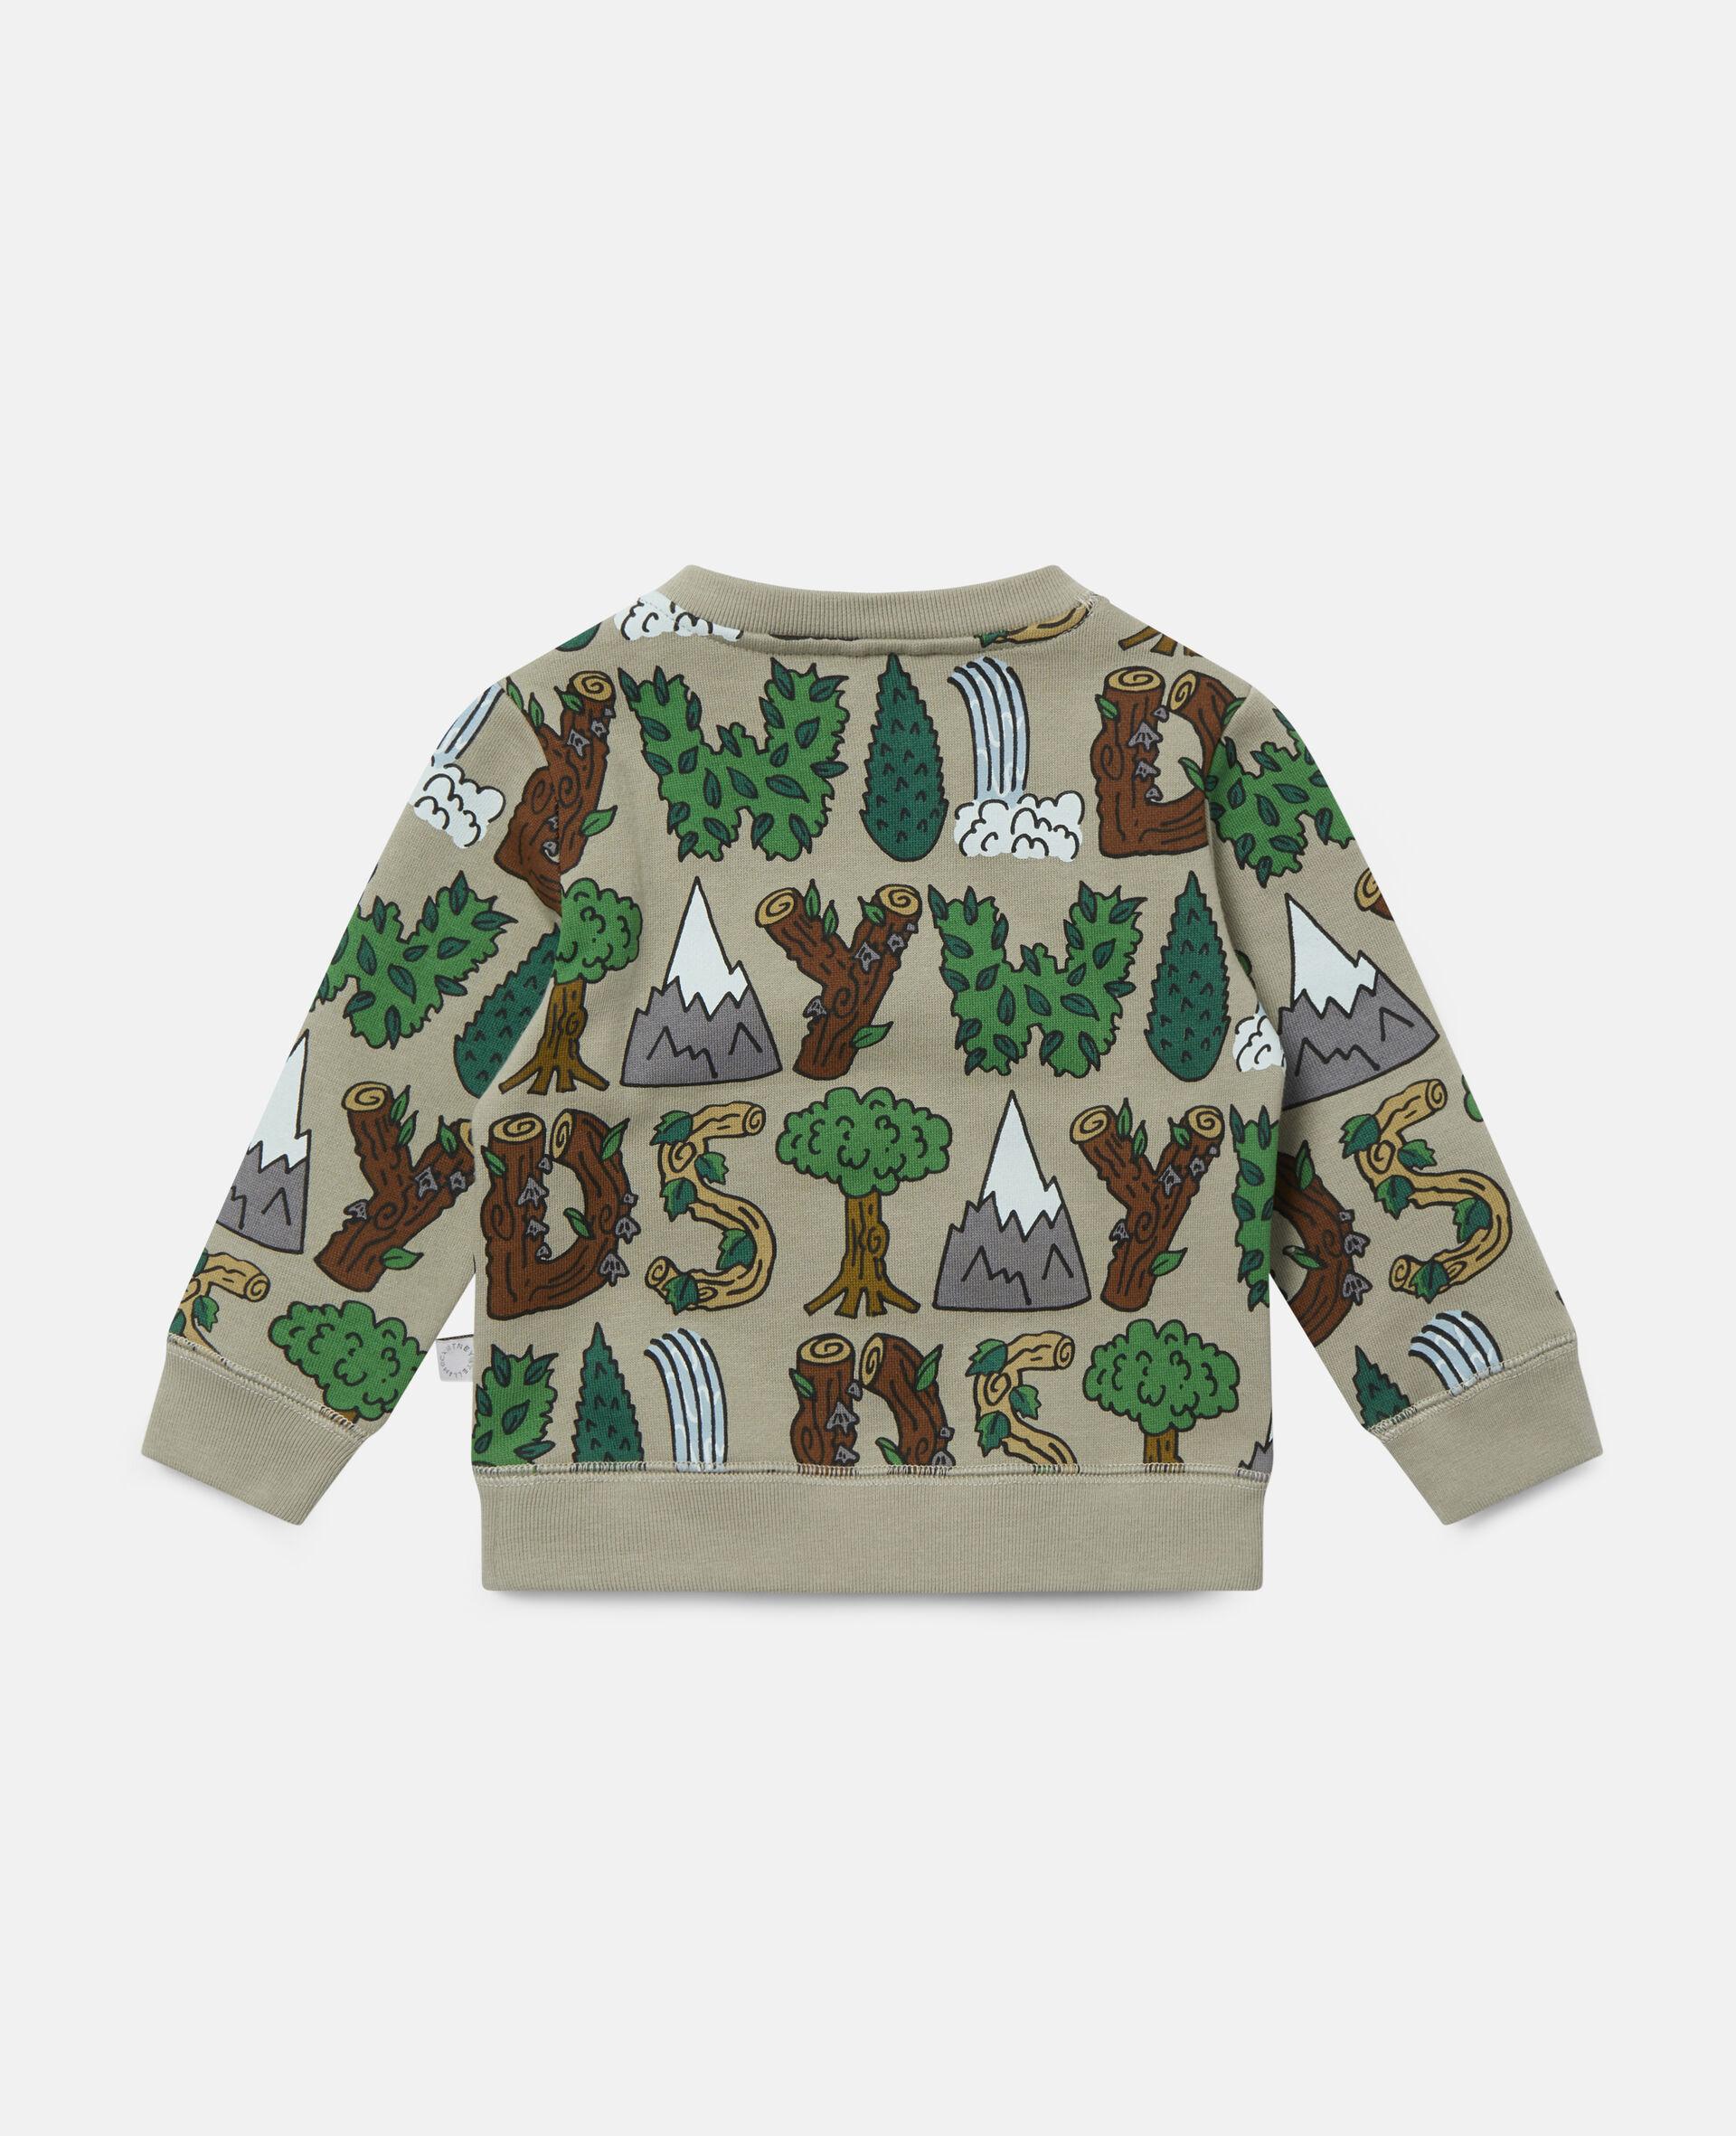 Stay Wild' Fleece Sweatshirt-Green-large image number 3